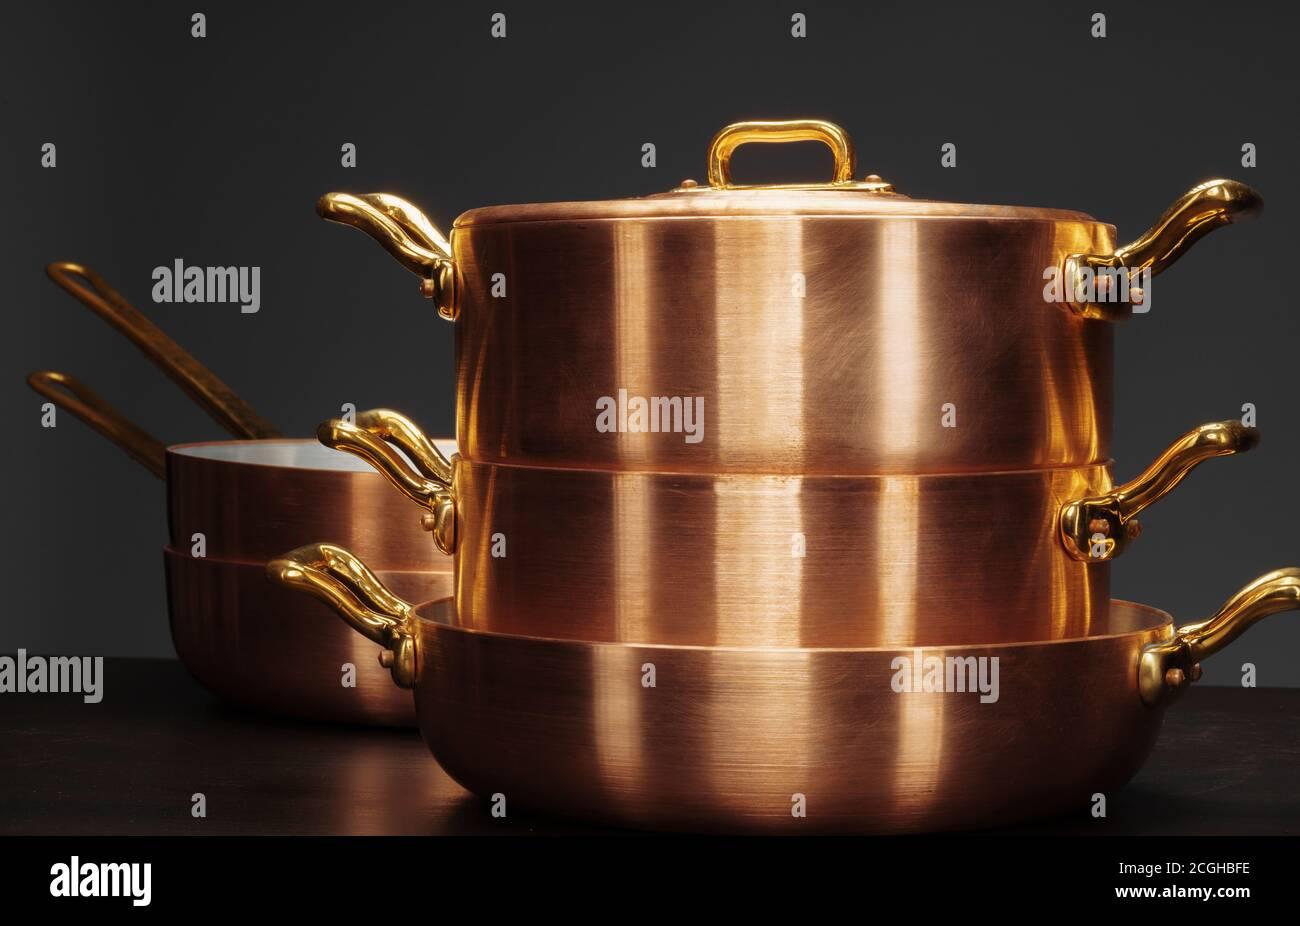 Utensilios De Cocina De Cobre Fotos e Imágenes de stock Alamy